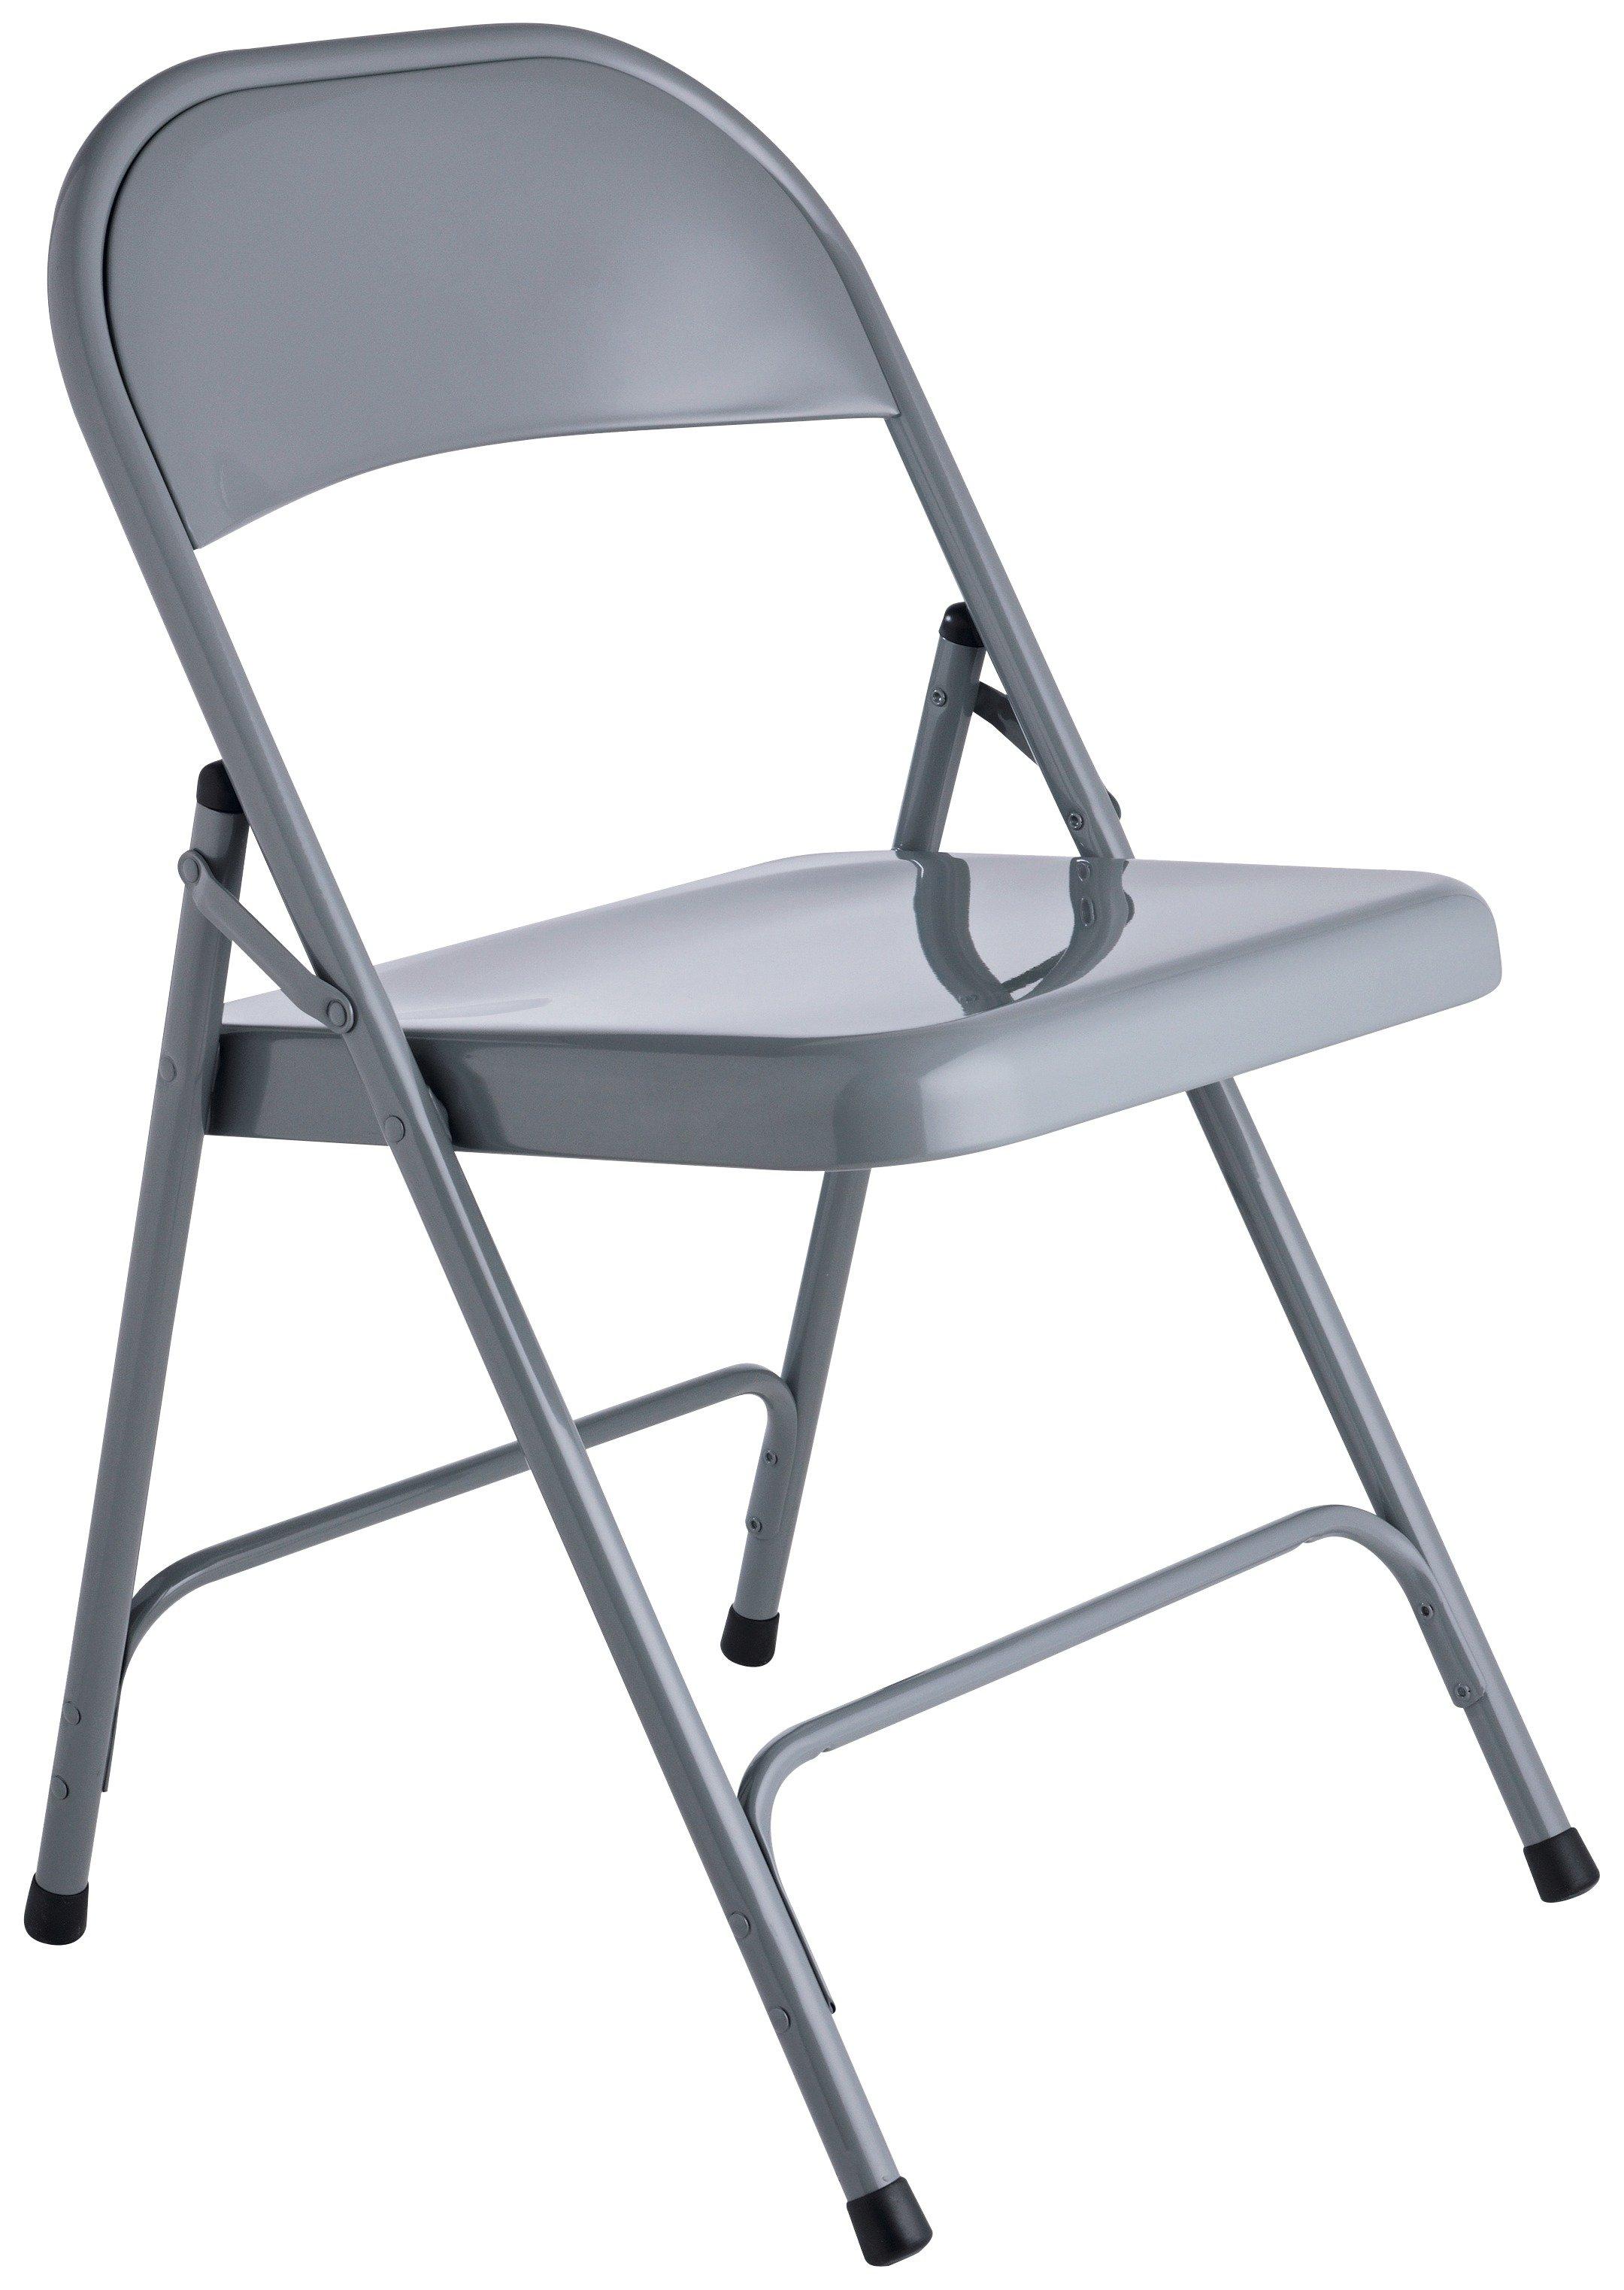 Habitat Macadam Metal Folding Chair - Grey at Argos